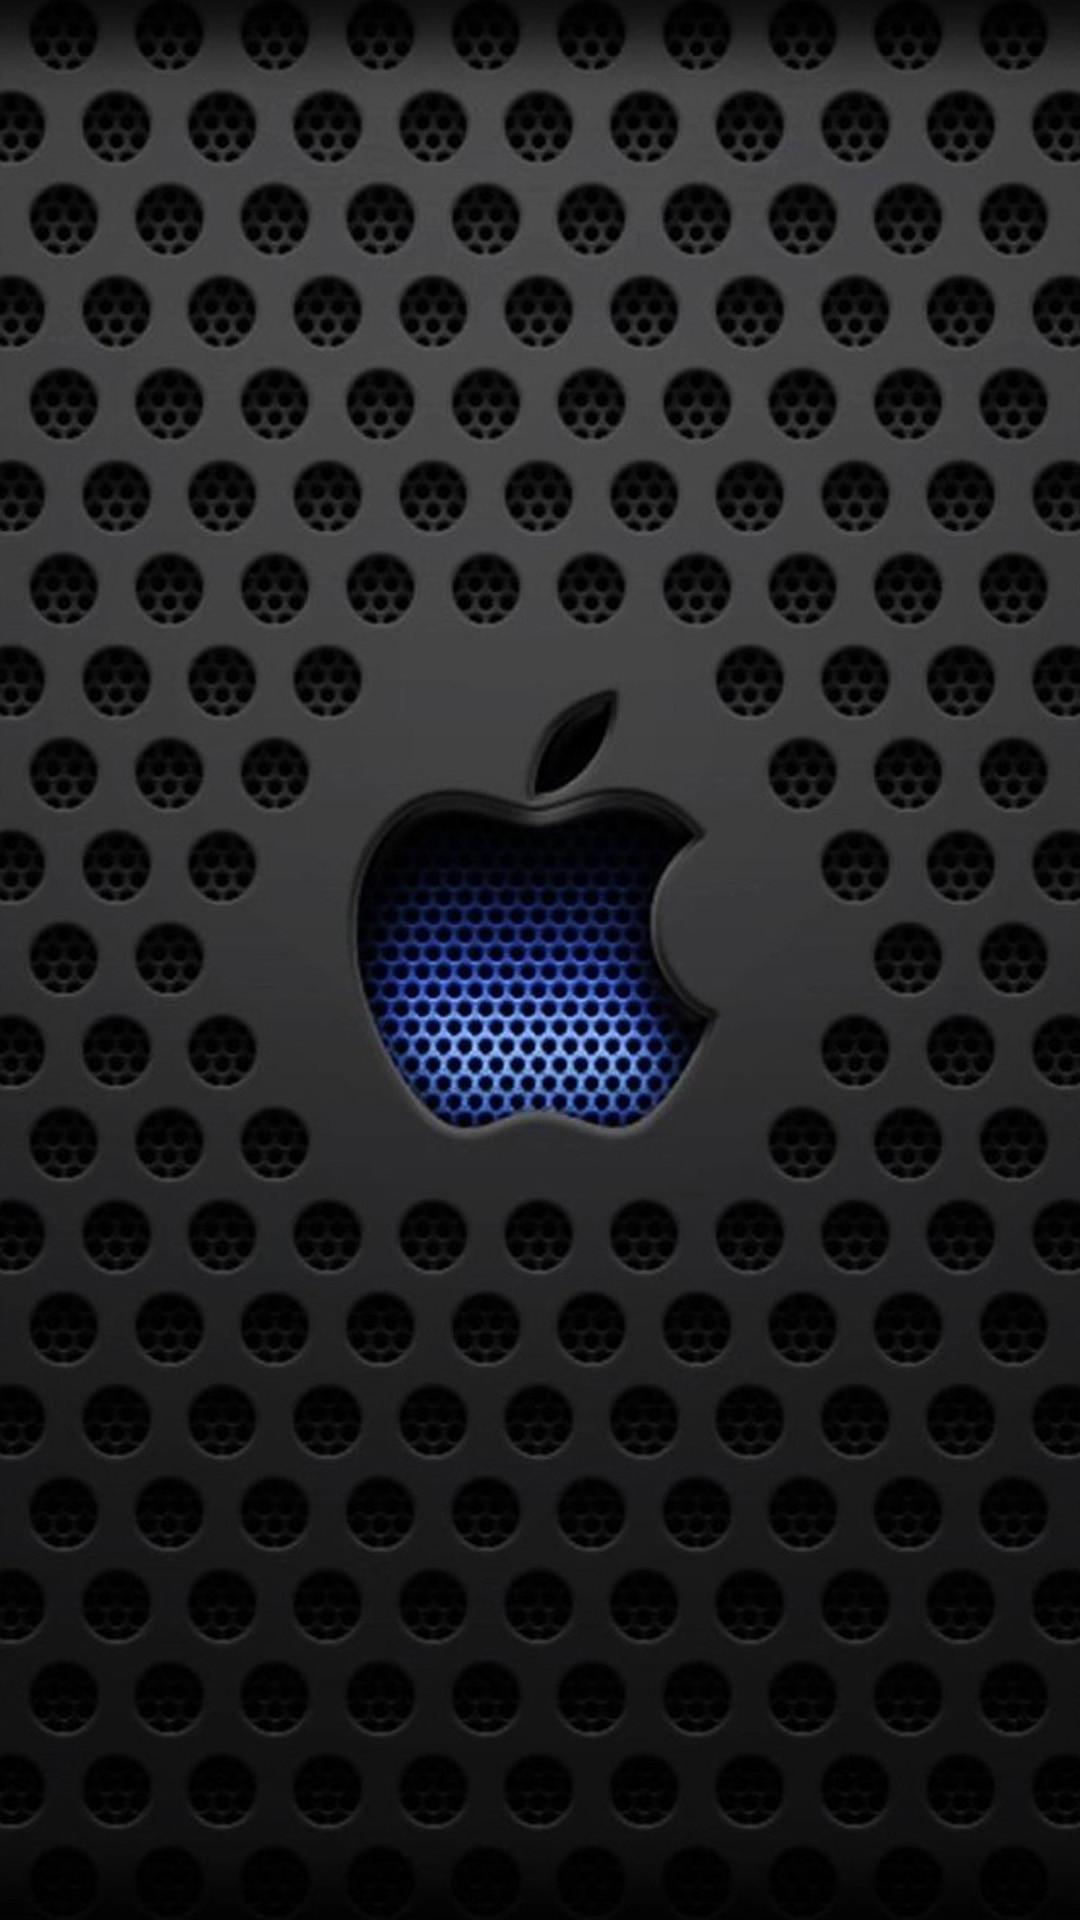 Apple iPhone 6 Plus Wallpaper